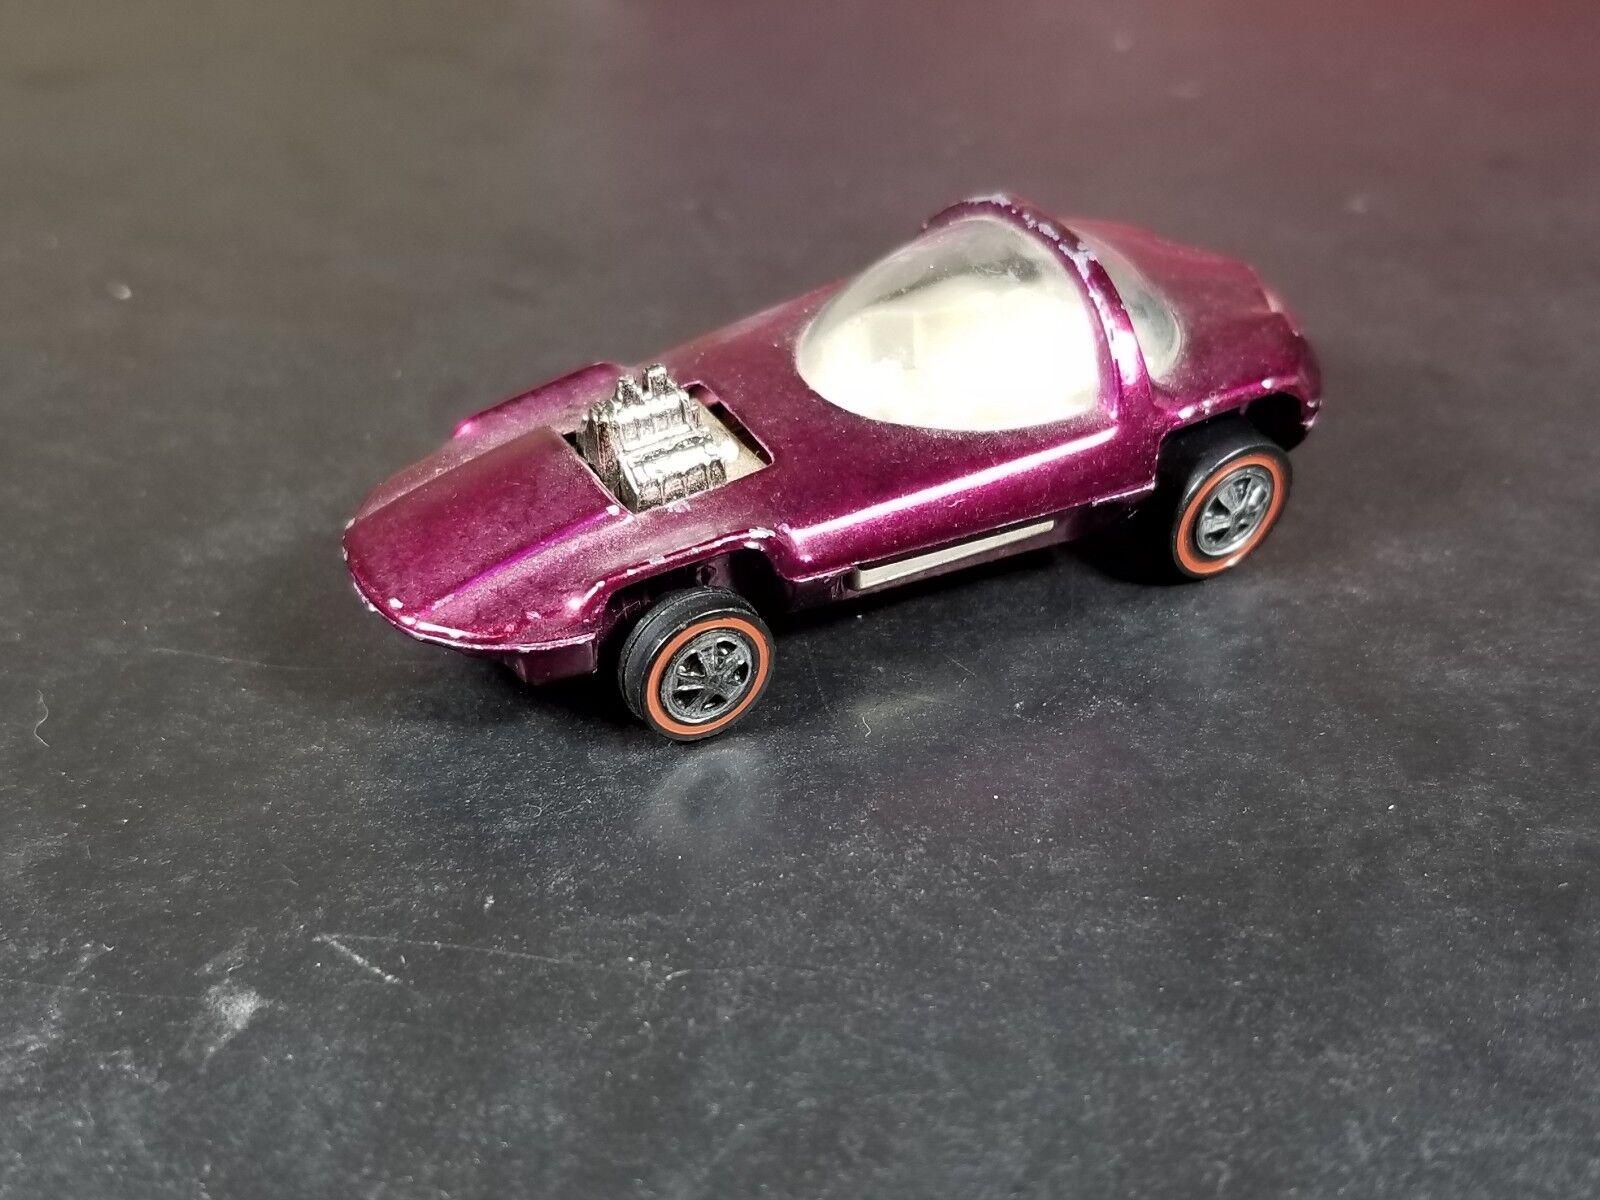 Hot Wheels Silhouette Silhouette Silhouette Redline Vintage US Magenta c2d780